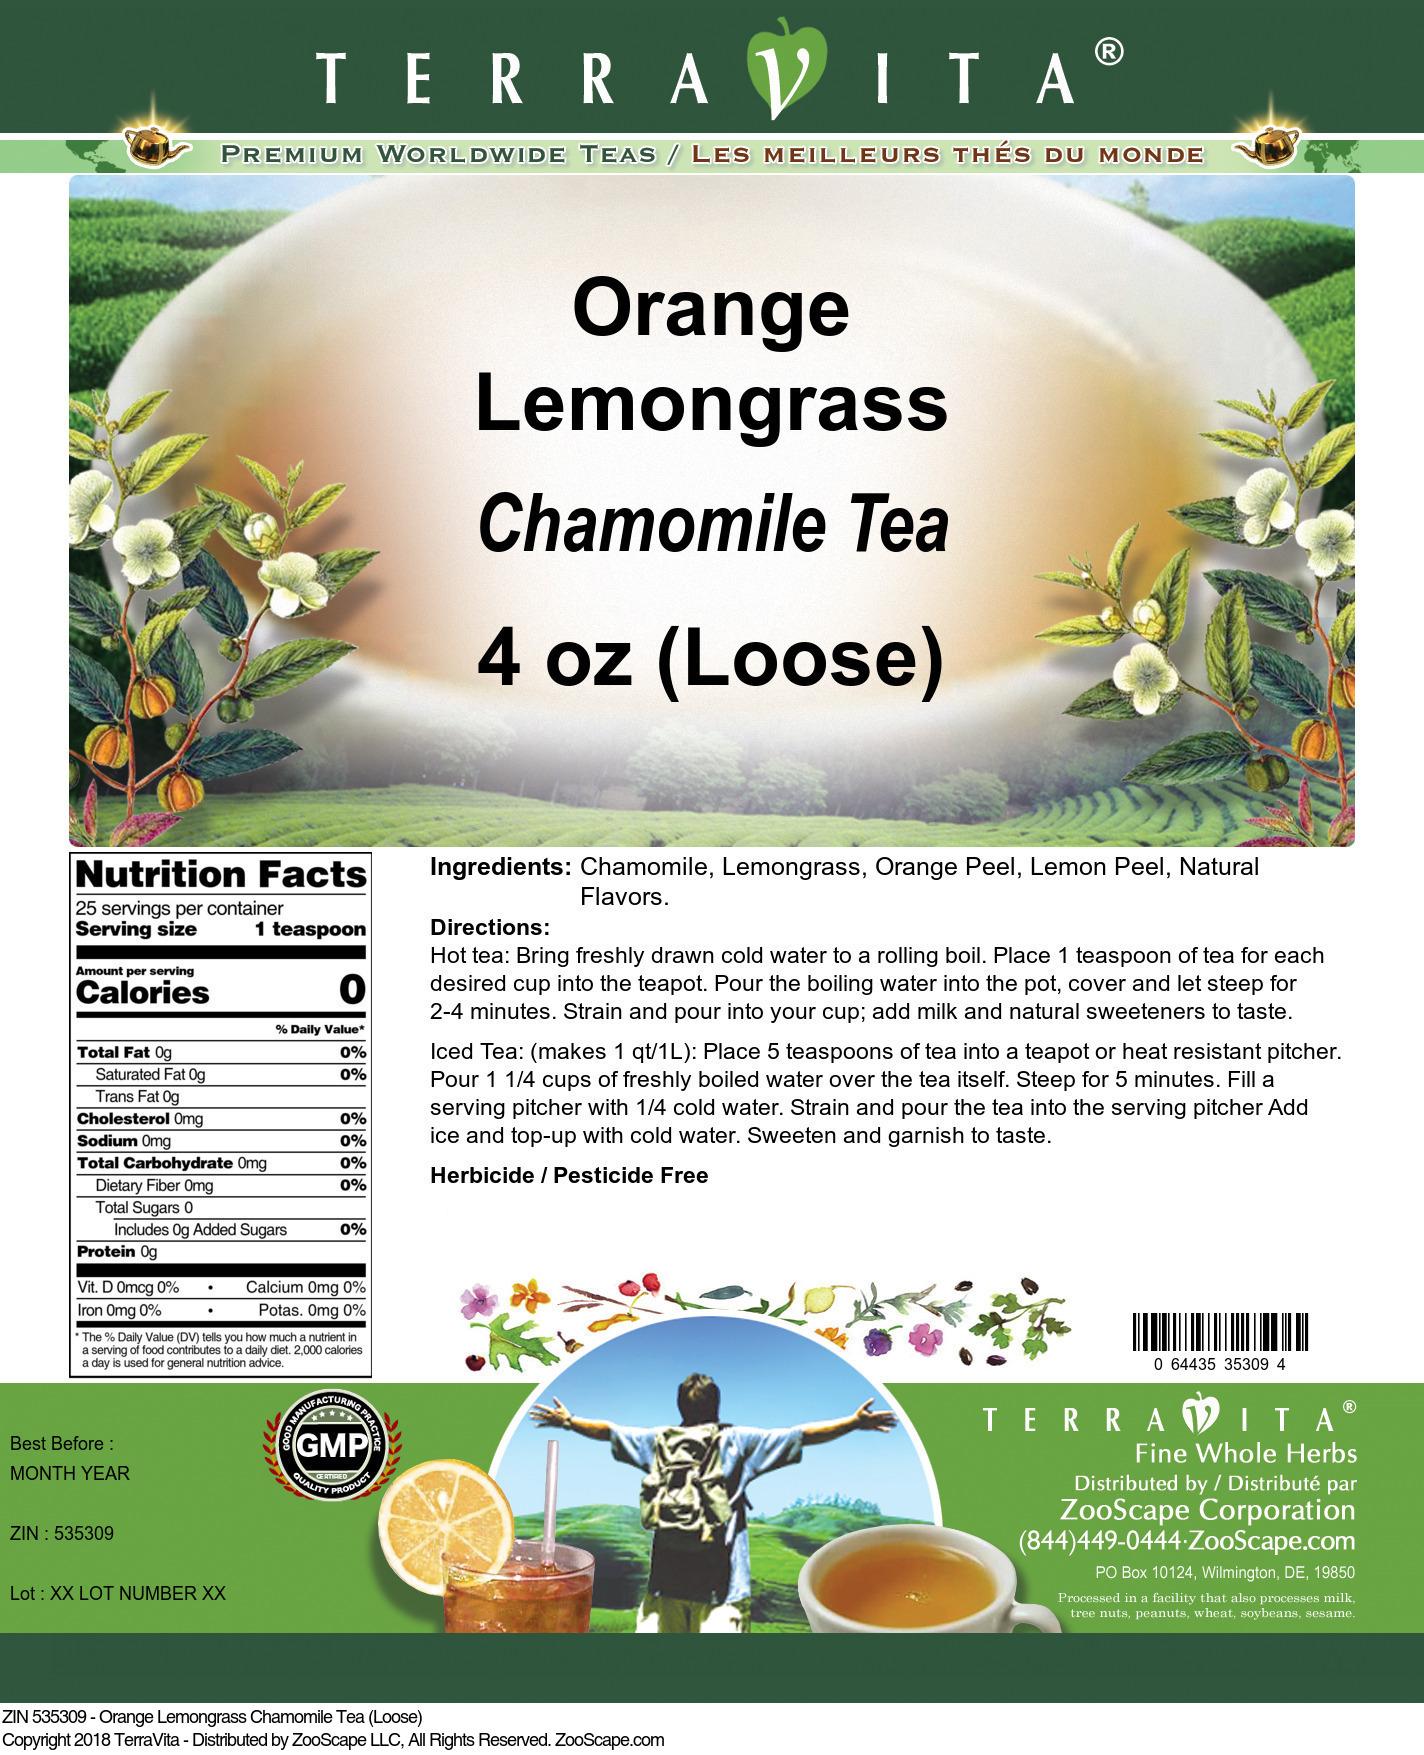 Orange Lemongrass Chamomile Tea (Loose)